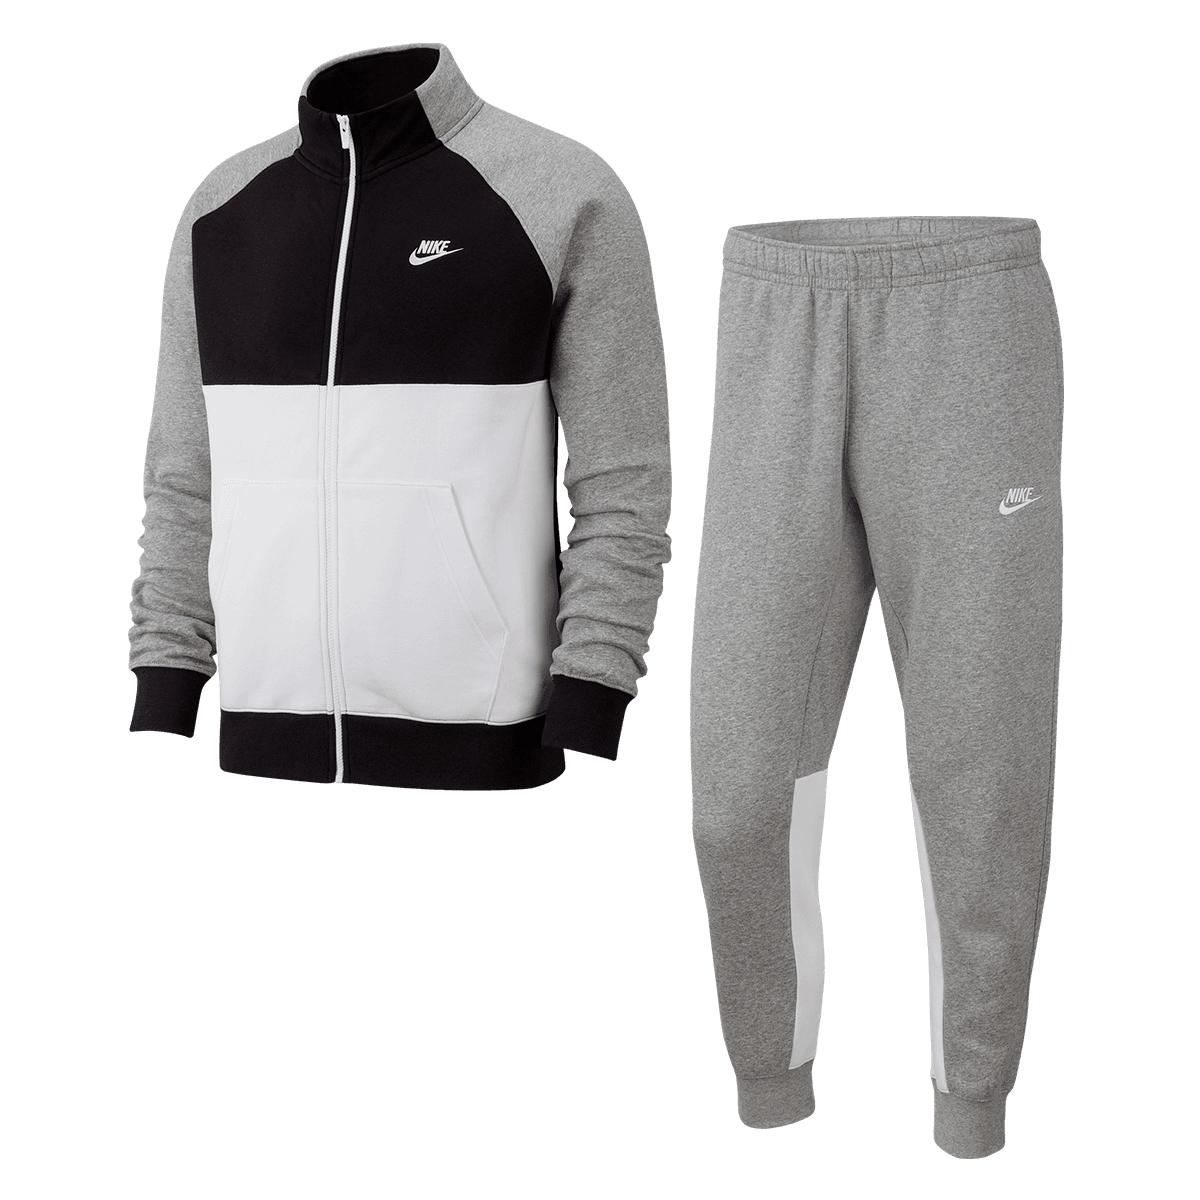 Nike Trainingsanzug Sportswear CE Track Suite Fleece dunkelgrau/schwarz (Gr. S-XL)